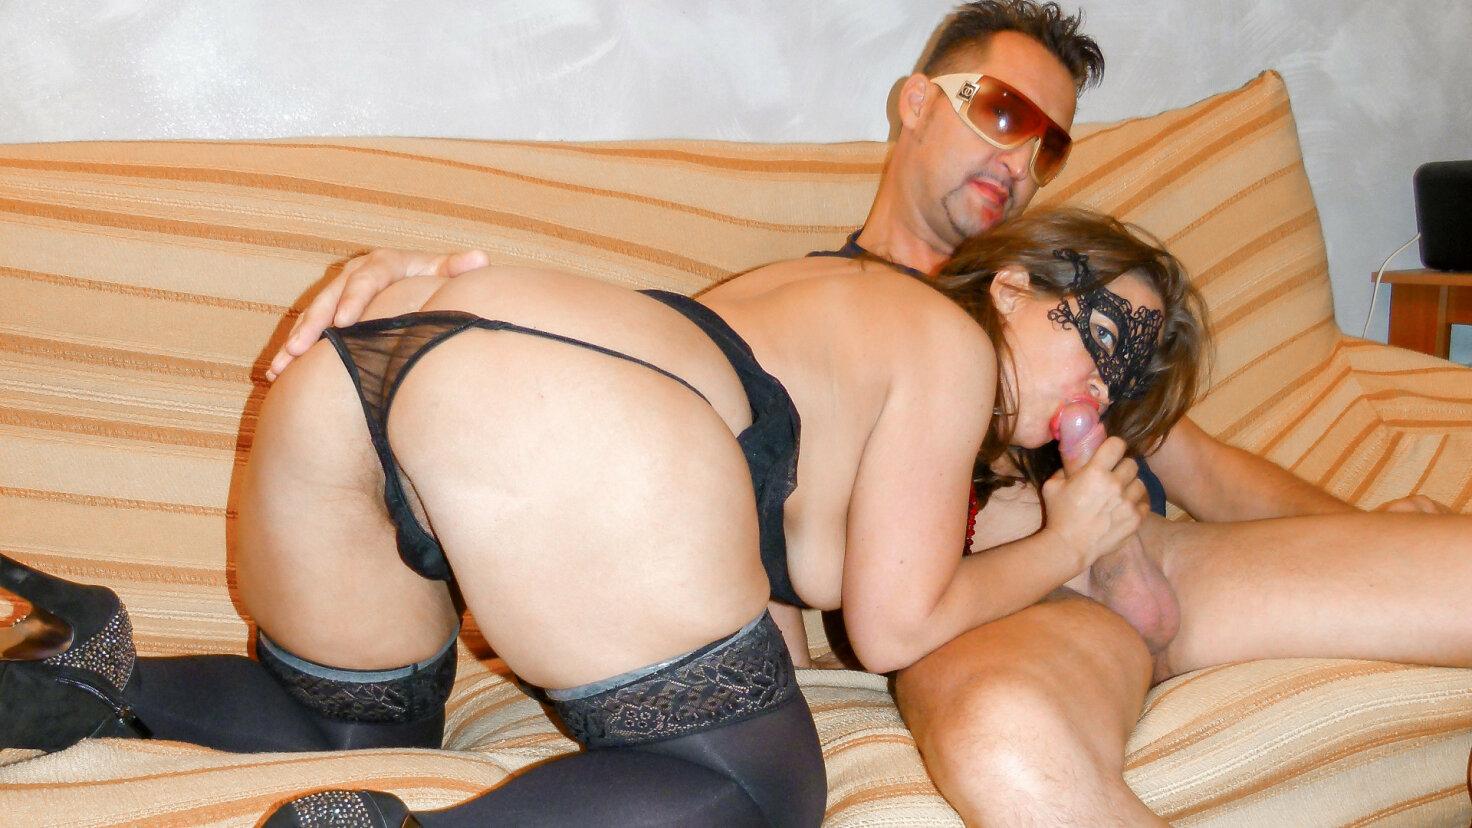 Naughty Italian swinger sex with masked mature newbie Fabiola